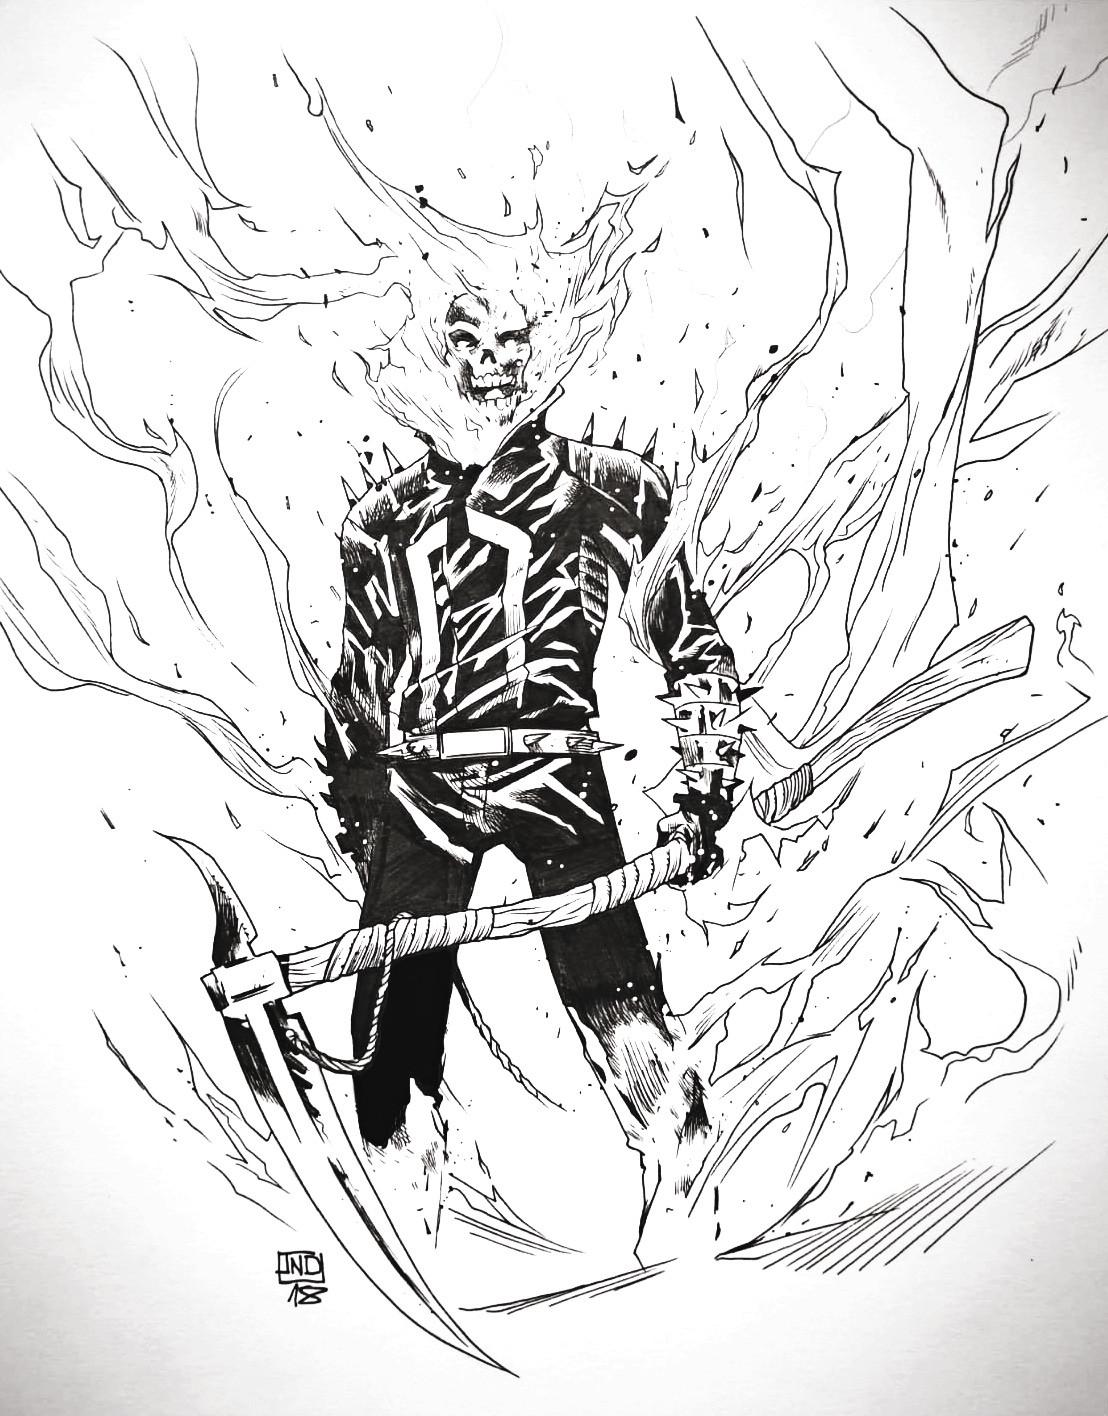 concept by: Stefano Landini Art Marvel an DC comics Artist www.stefanolandiniart.com